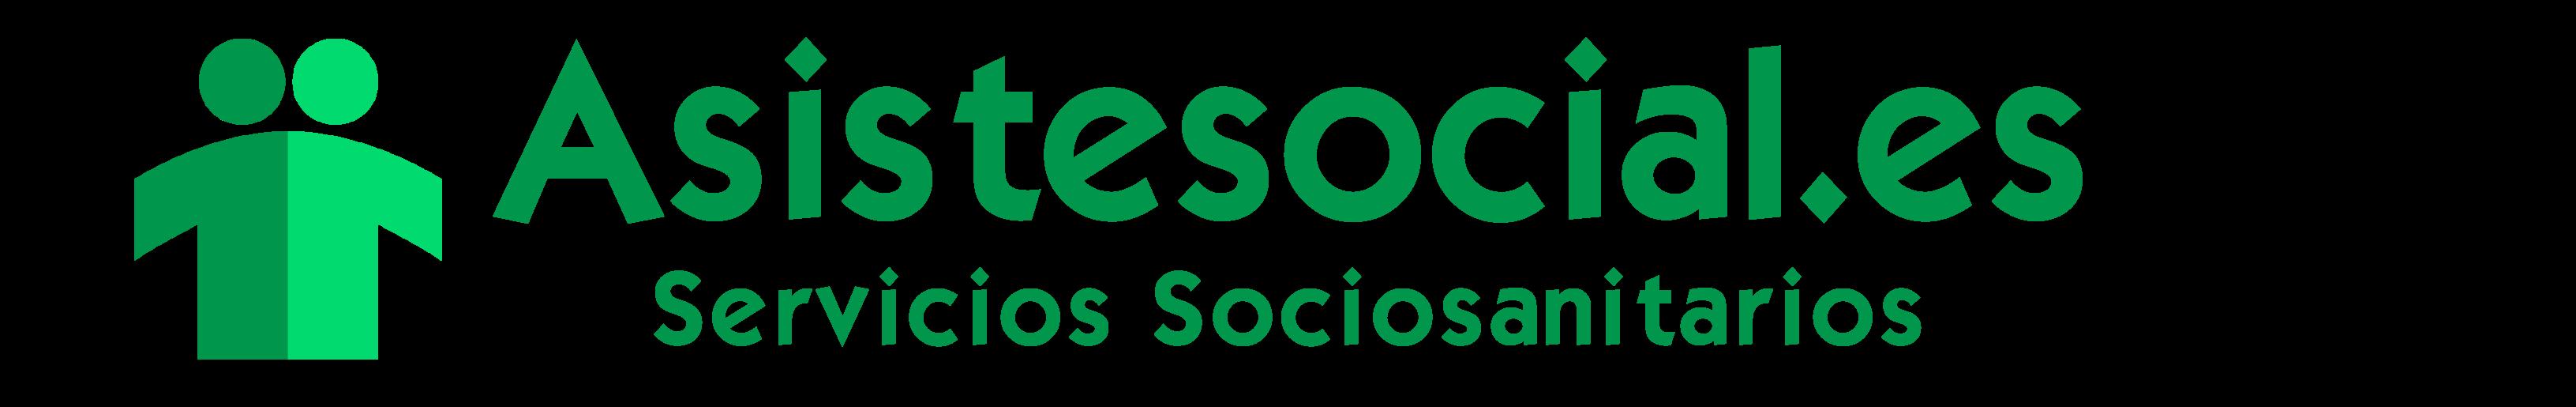 Asistesocial.es | Atención sociosanitaria